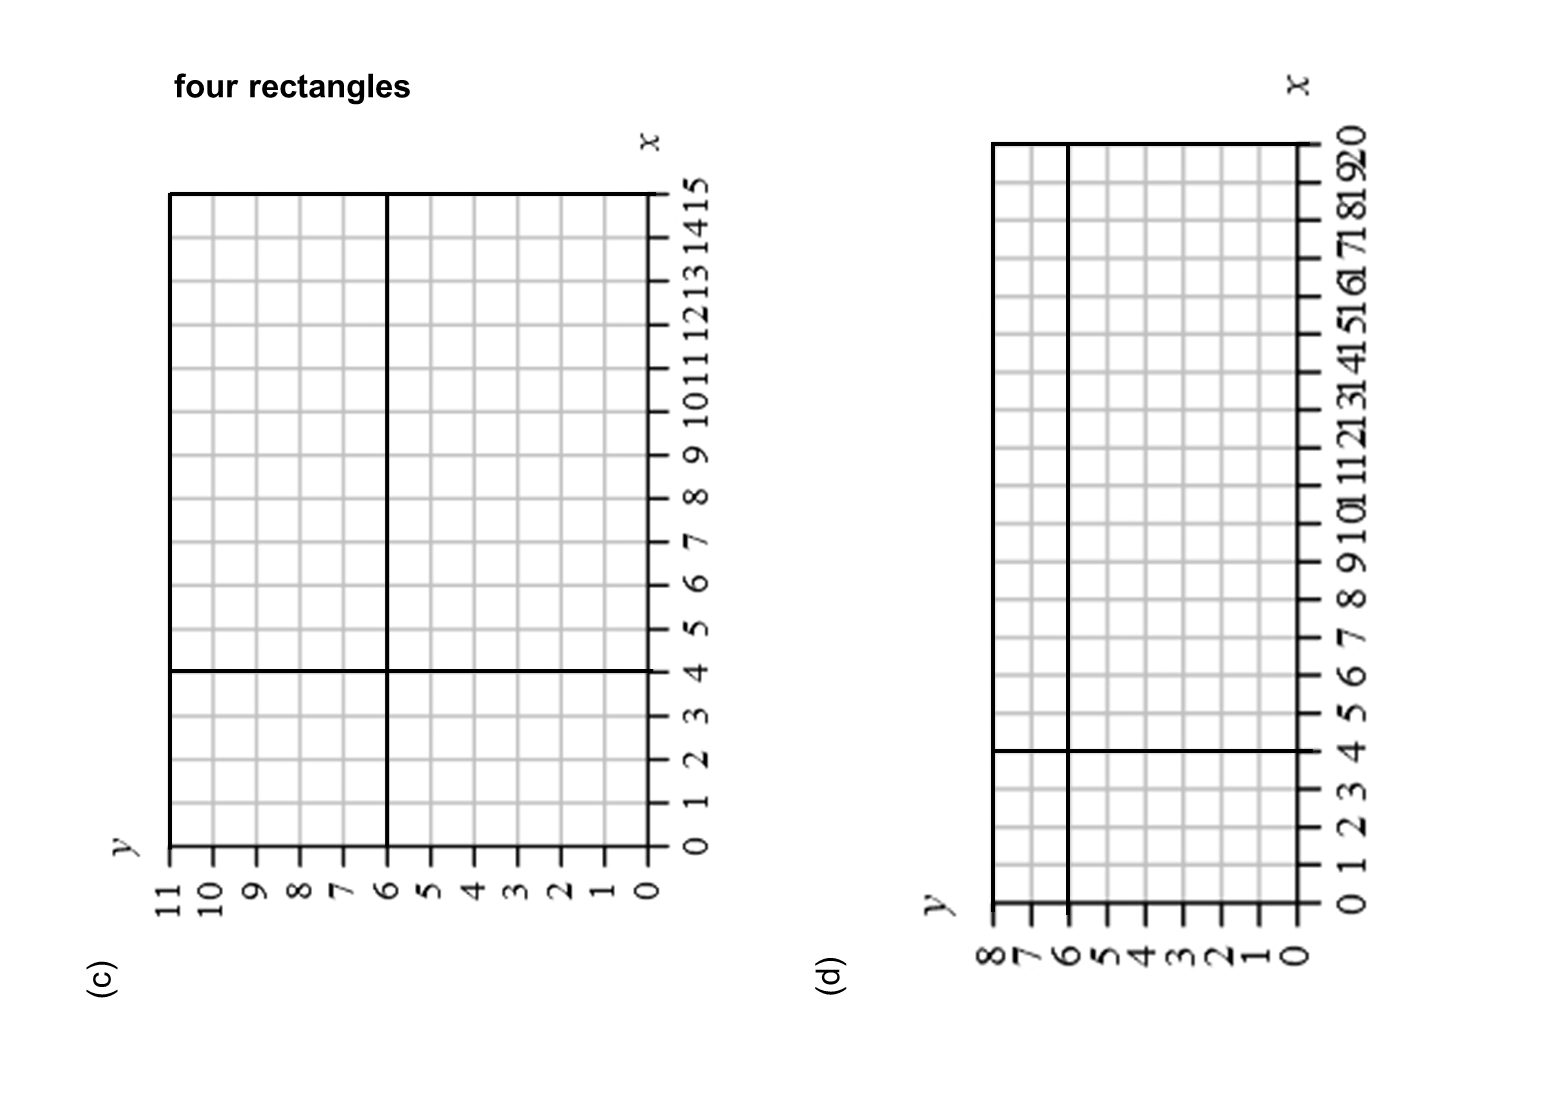 MEDIAN Don Steward mathematics teaching: four rectangles